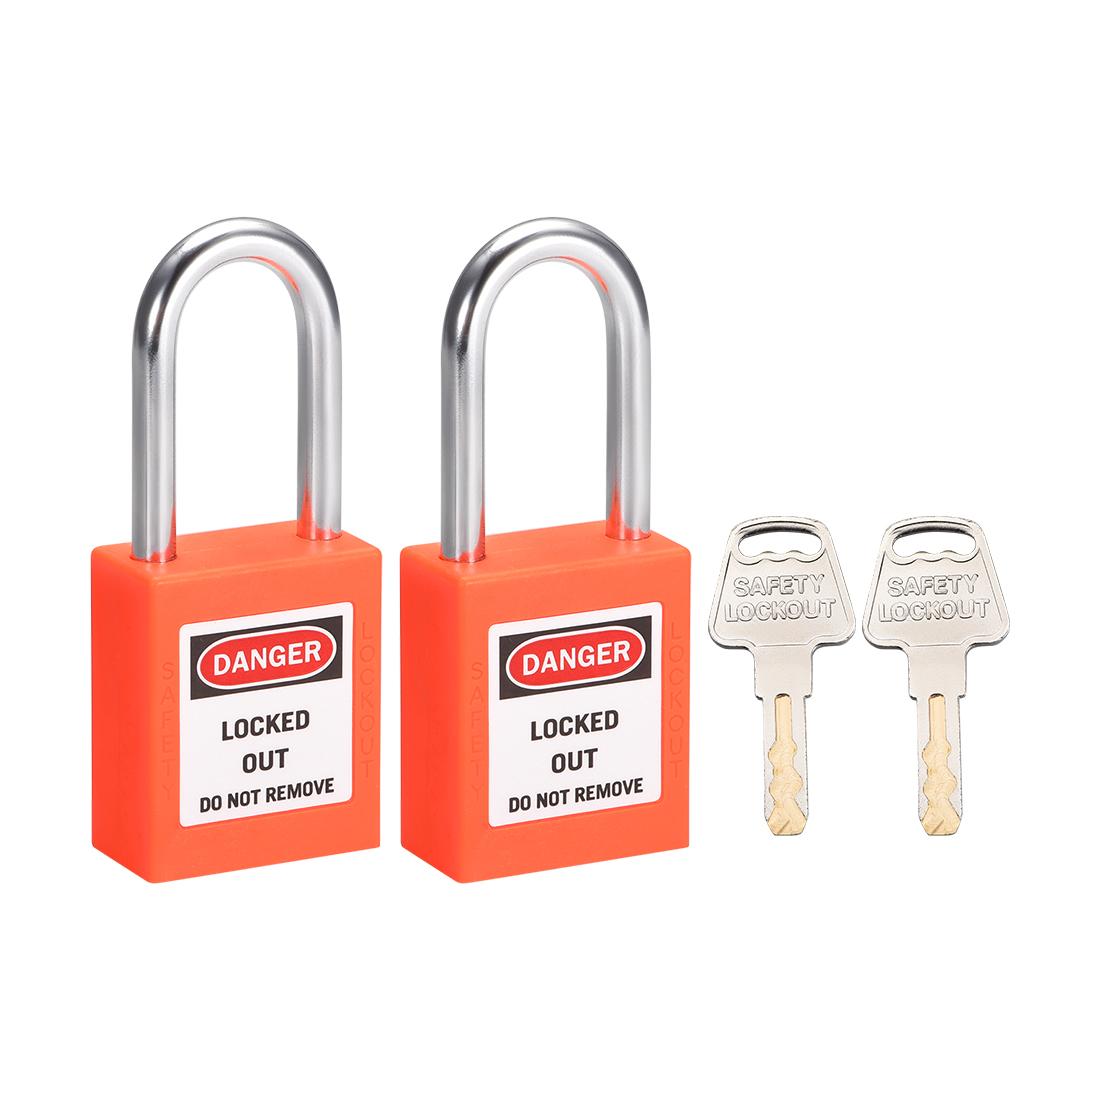 Lockout Tagout Locks 1-1/2 Inch Shackle Key Alike Safety Padlock Orange 2 Pcs